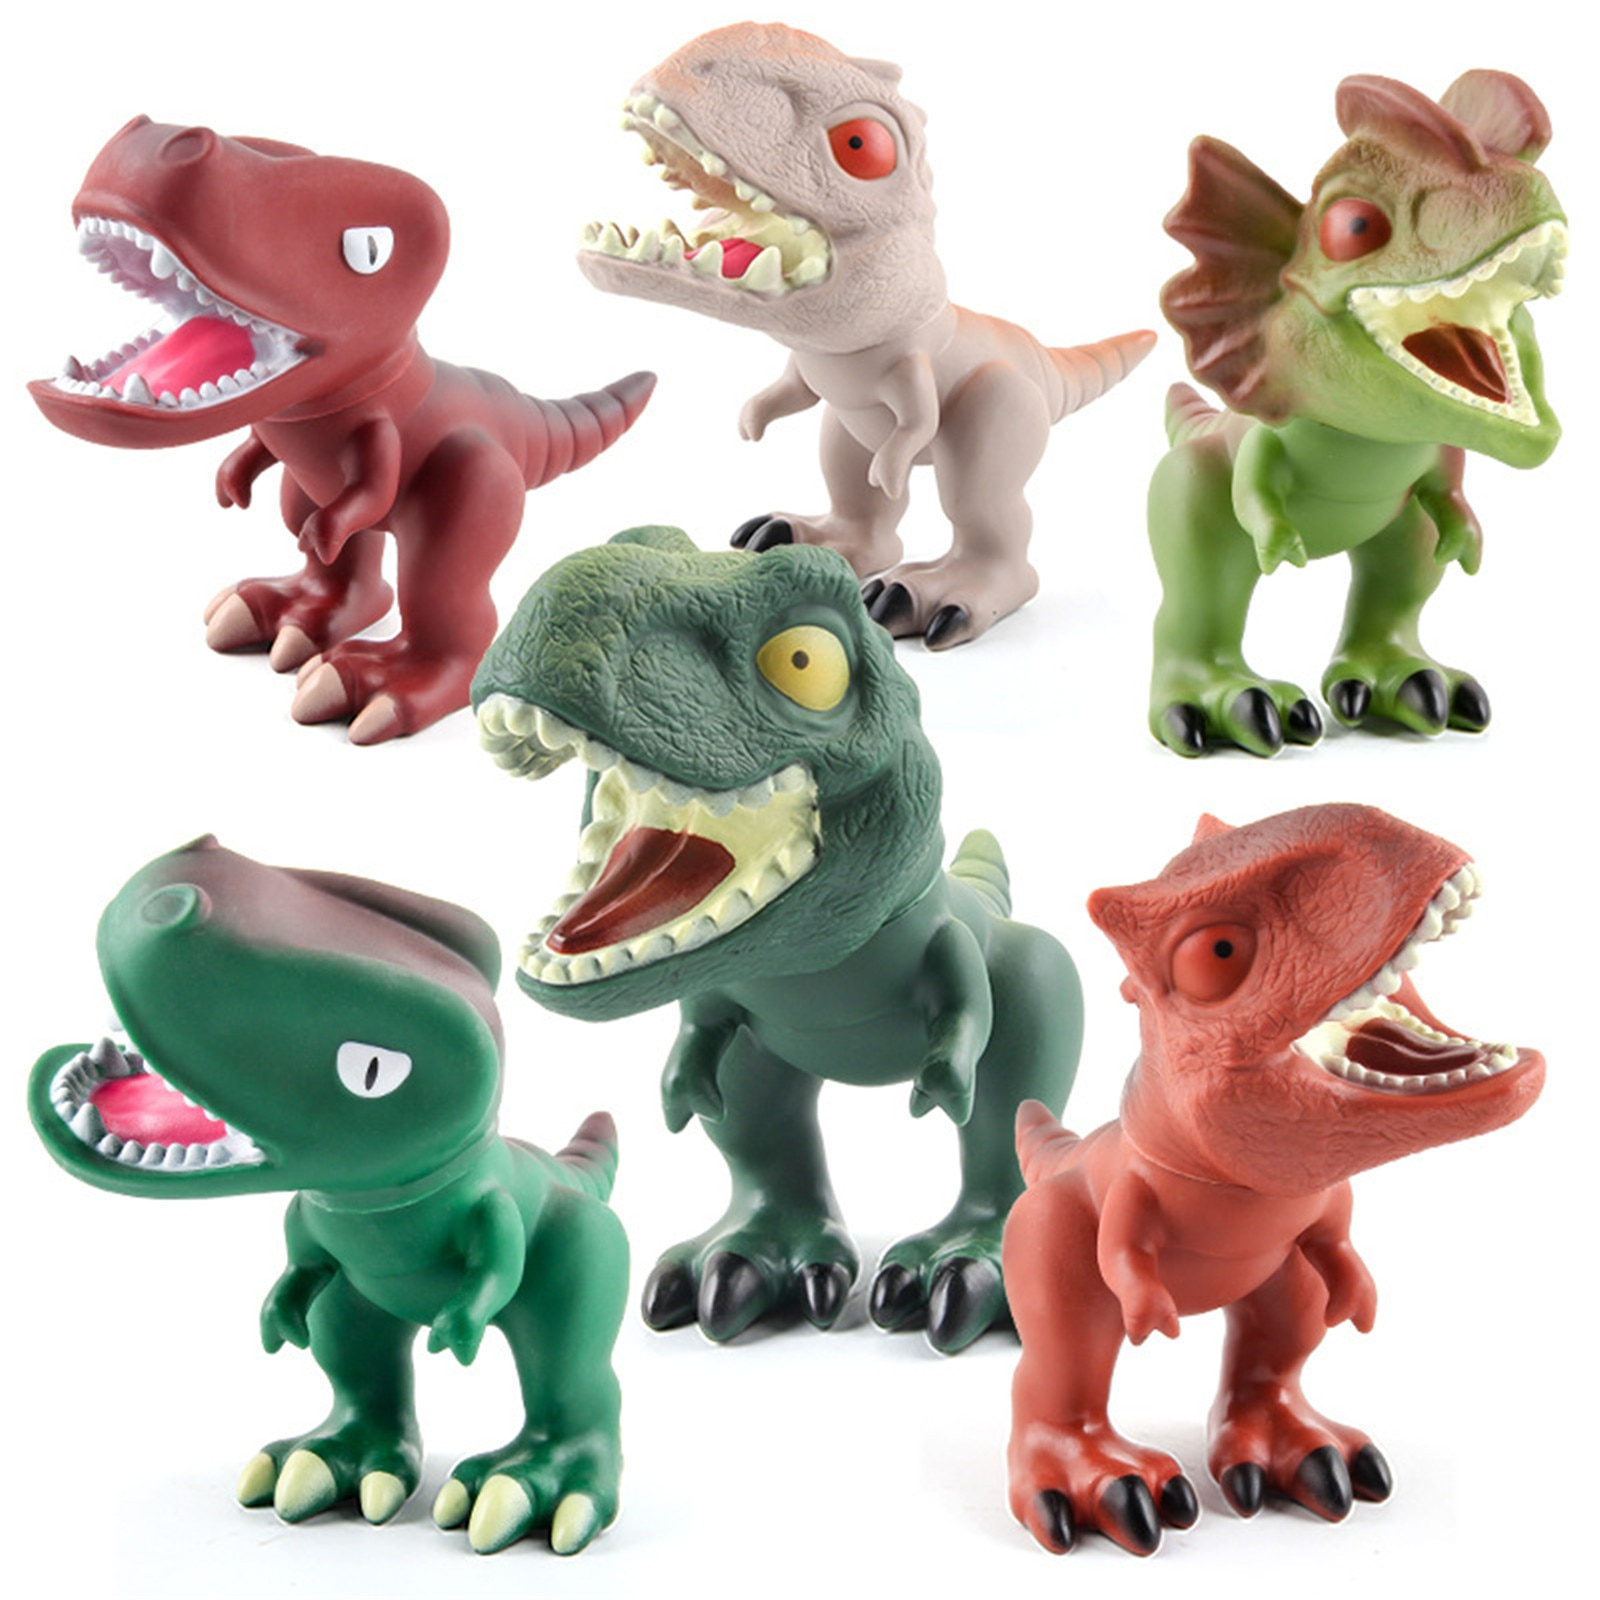 modelo de dinossauro de borracha macia 3d brinquedo realista dinossauro giratorio